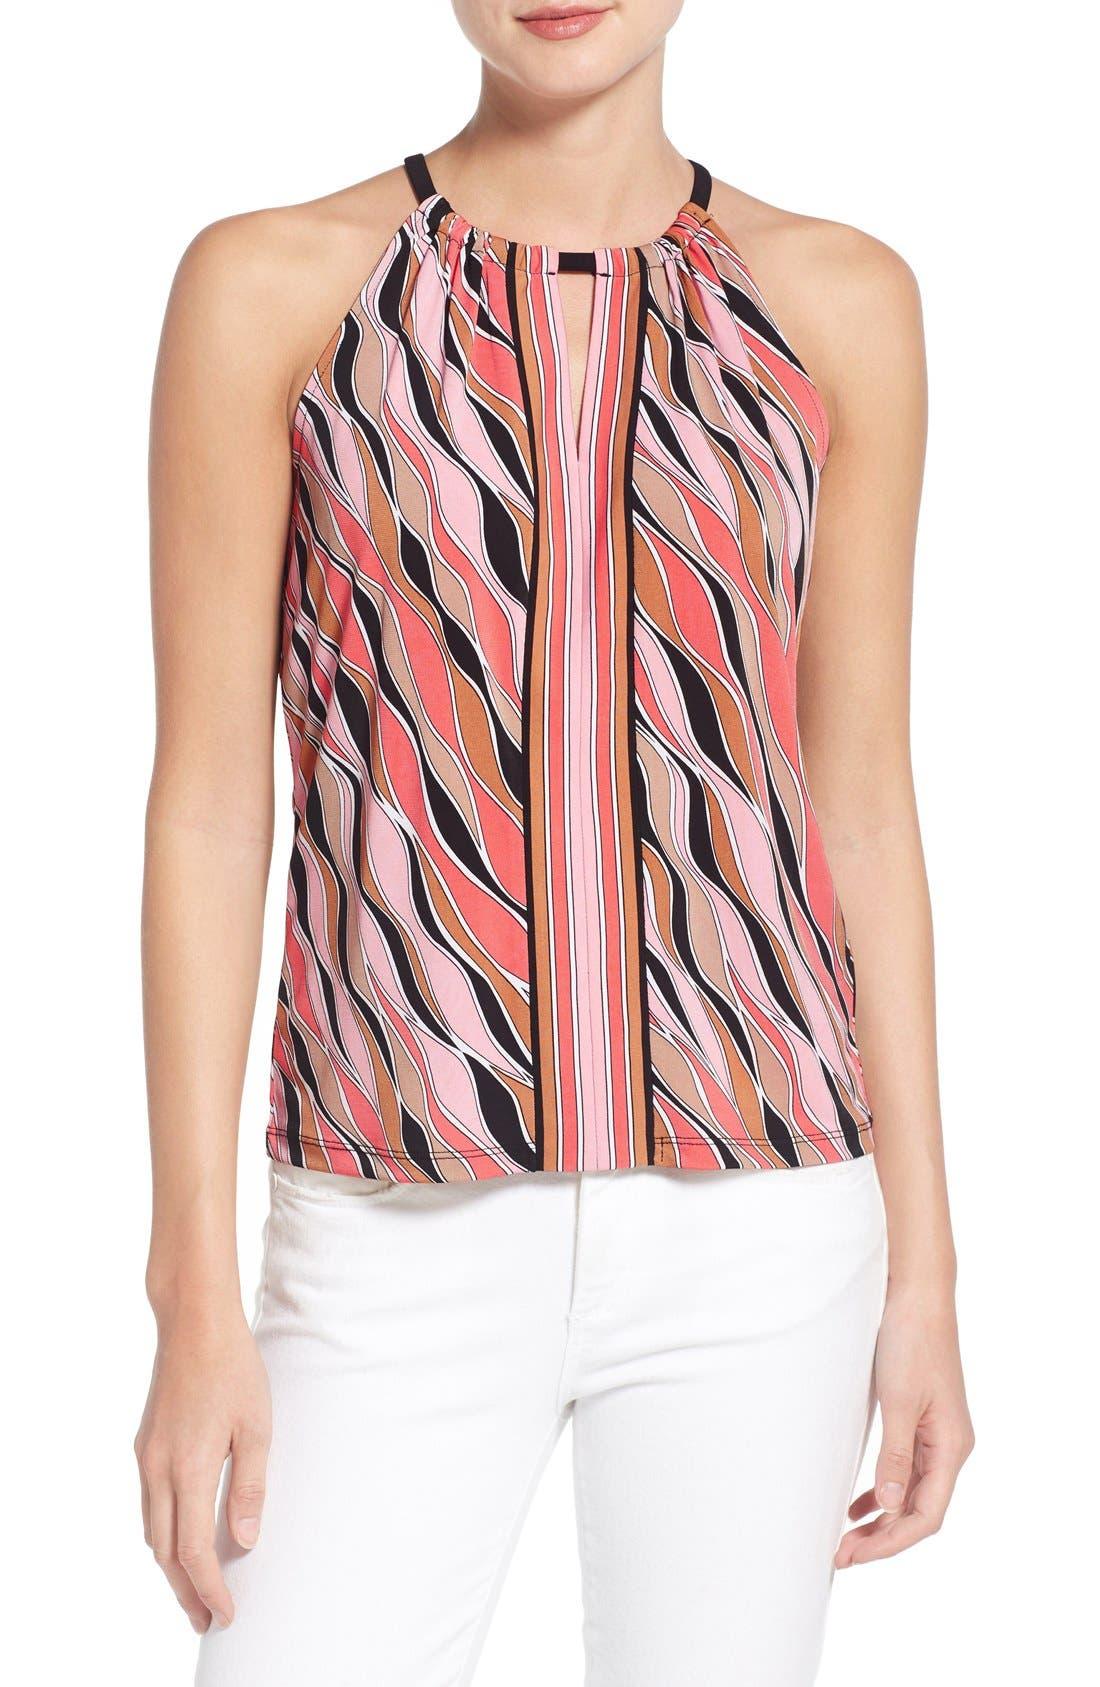 Main Image - MICHAEL Michael Kors 'Coley' Print Jersey Halter Style Top